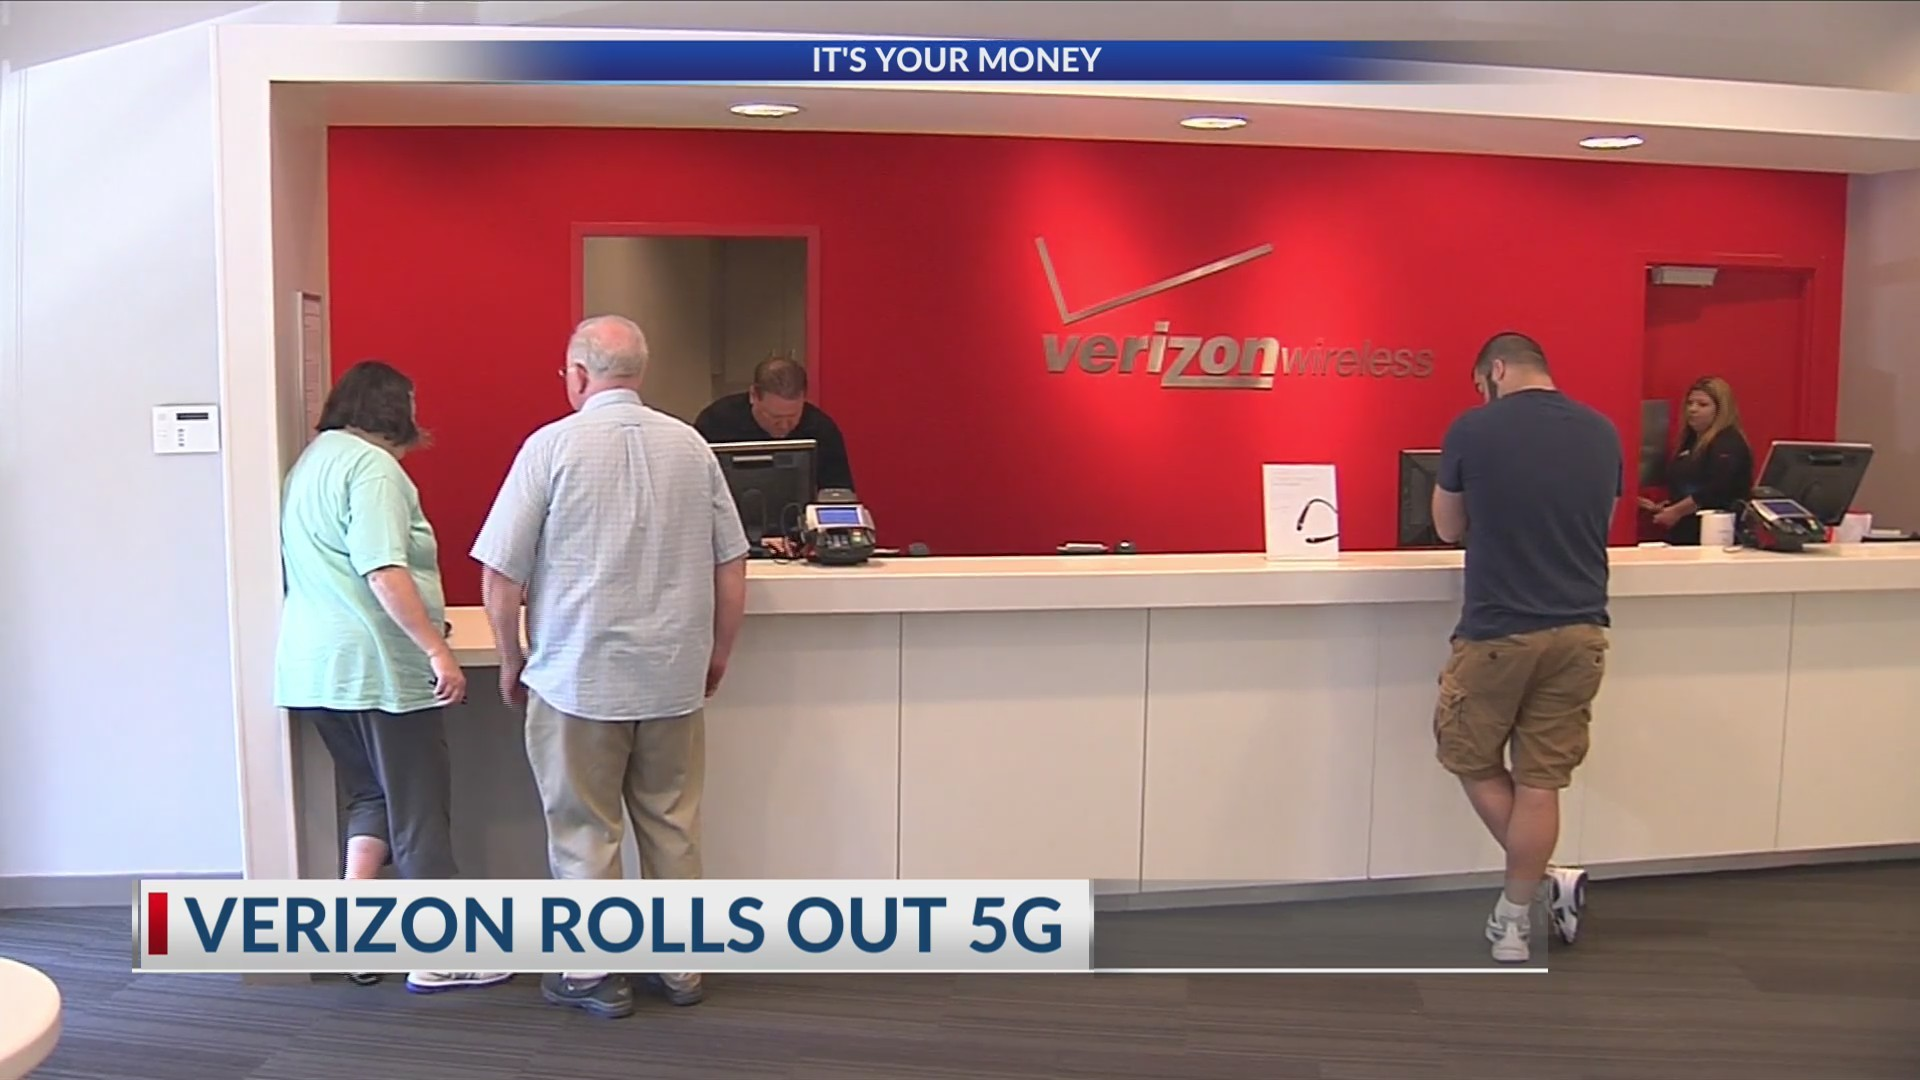 Verizon rolls out 5G